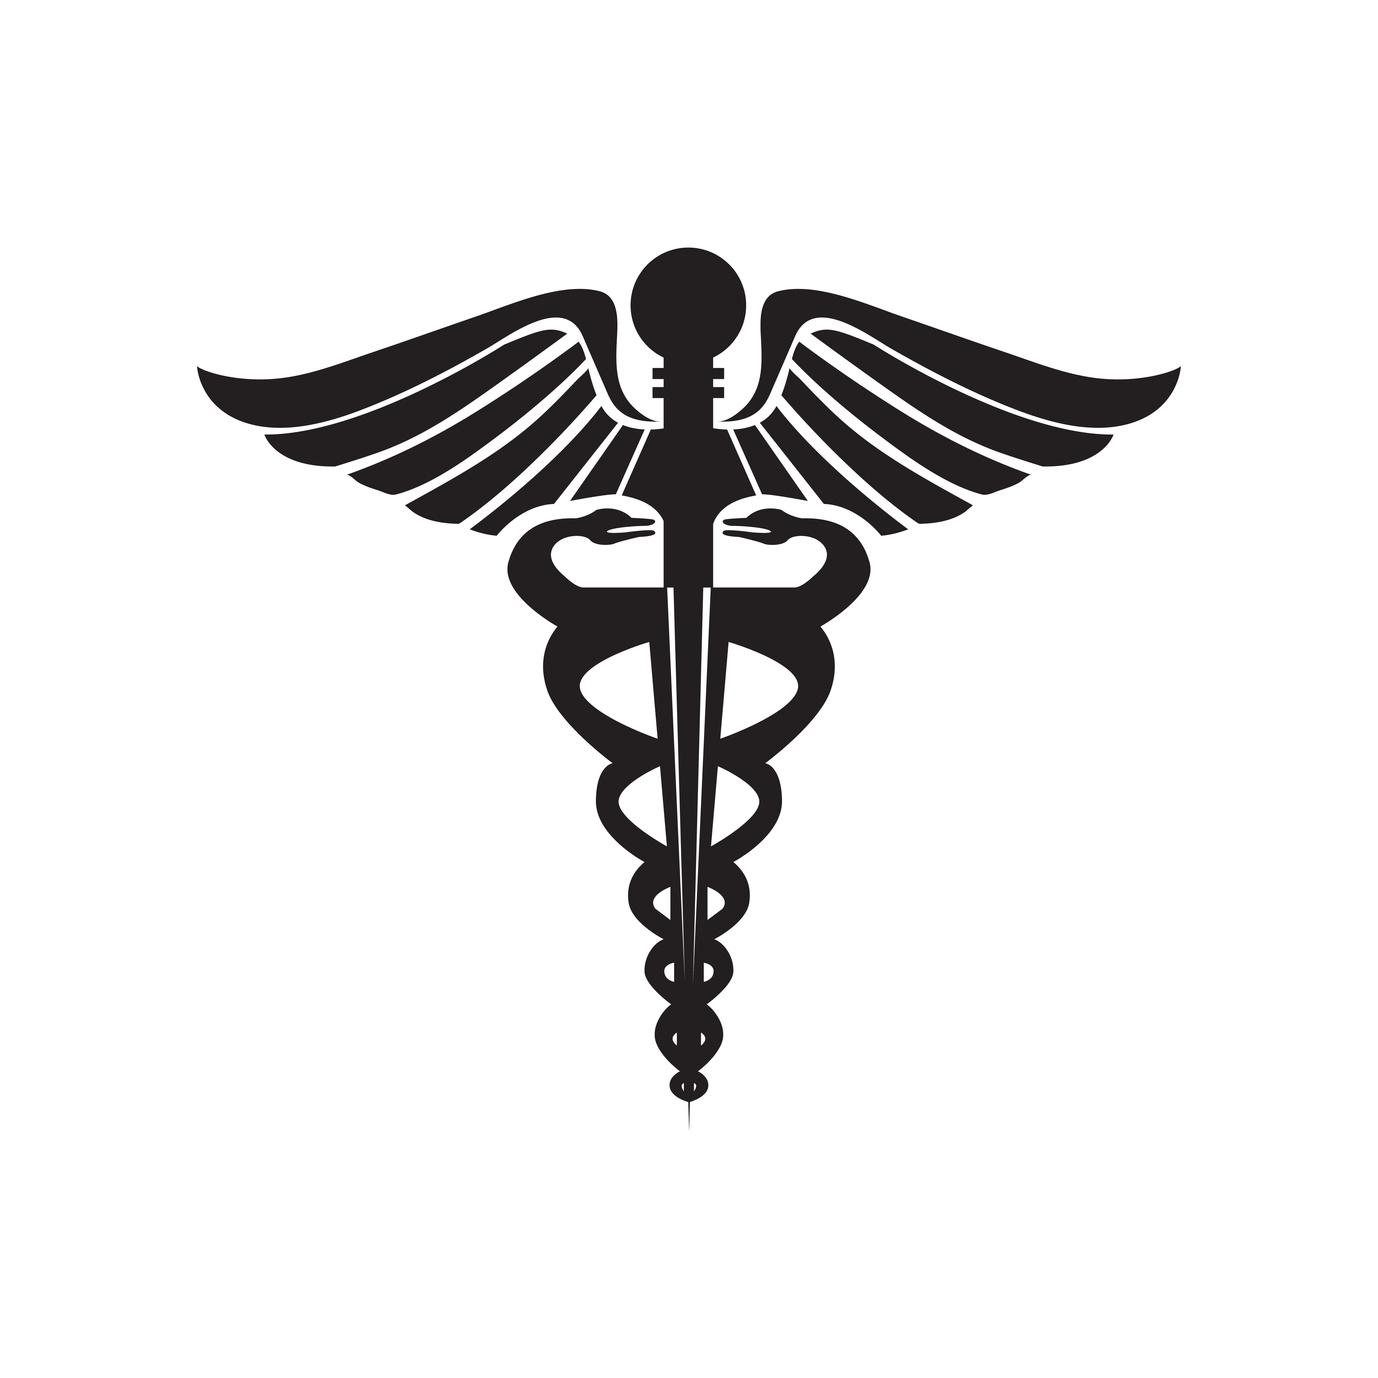 4 Medical Logos To Inspire Your Design Online Logo Maker S Blog